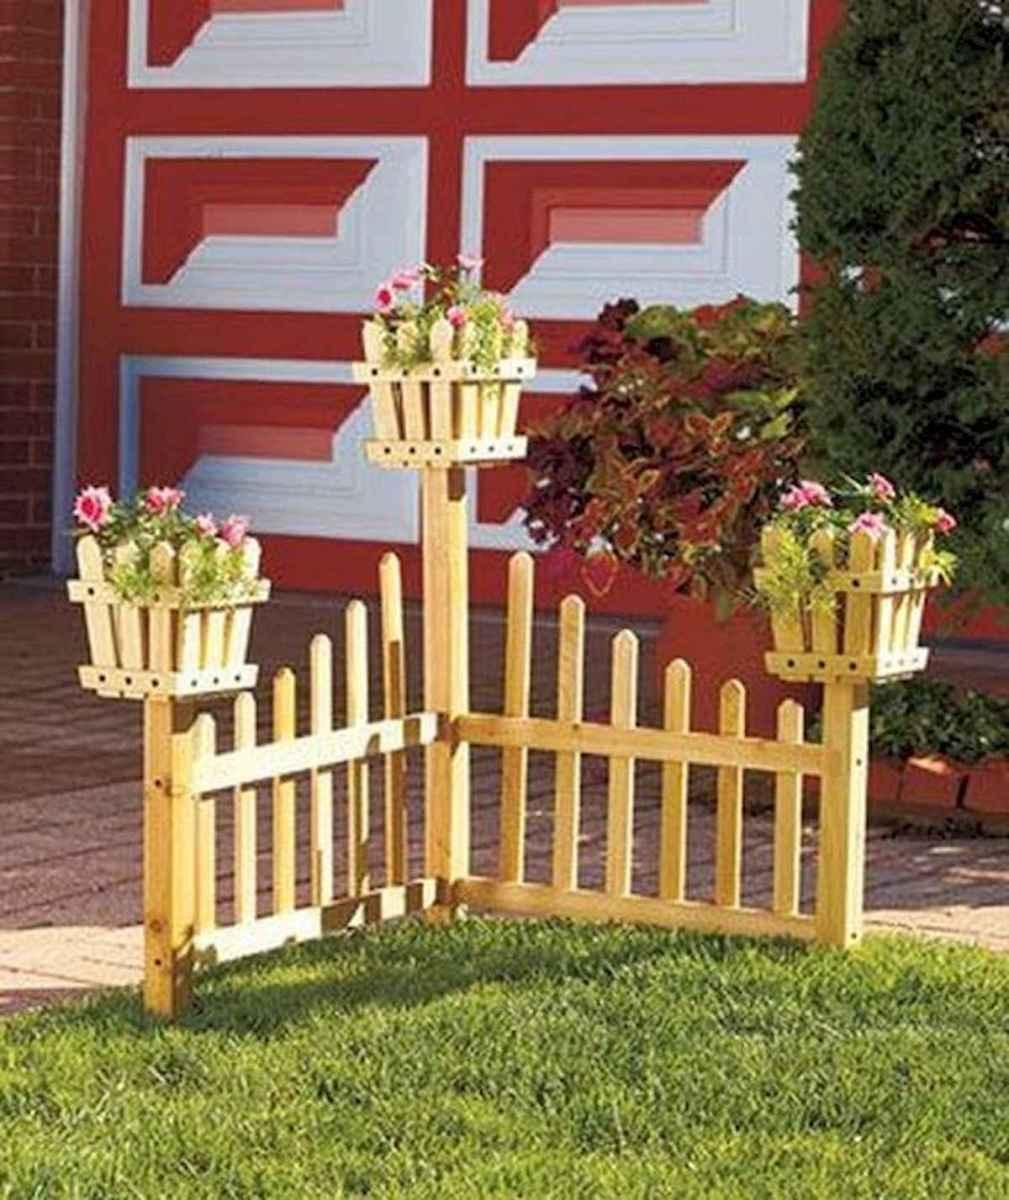 60 Gorgeous DIY Projects Pallet Fence Design Ideas (48)